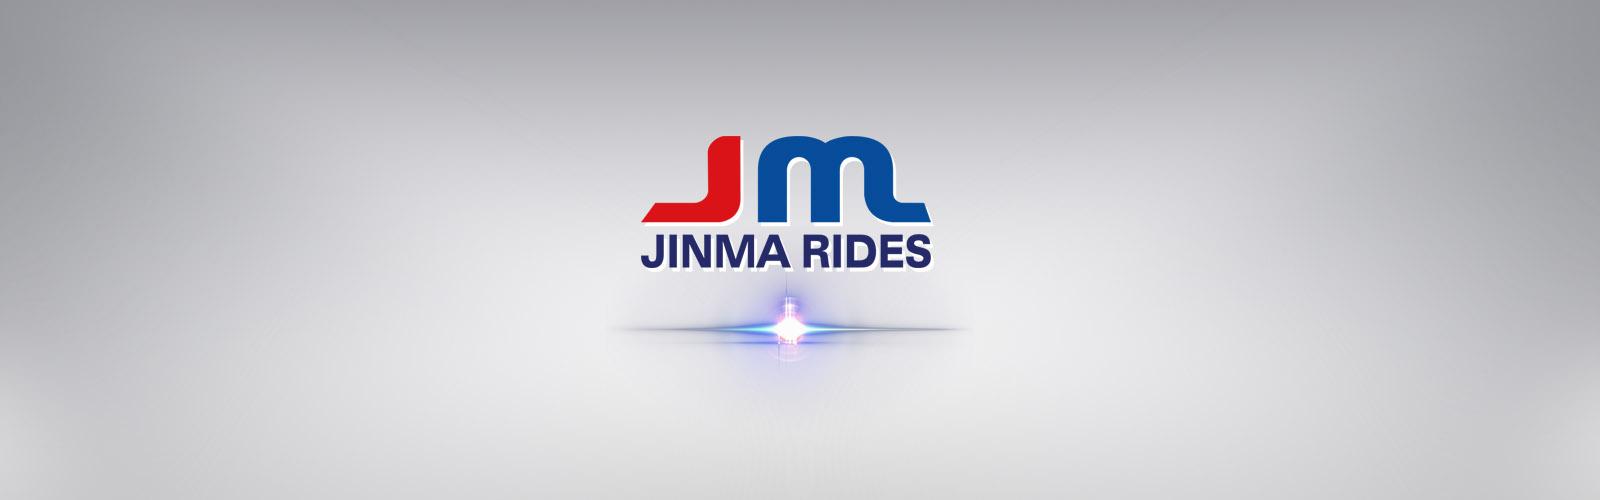 Jinma Rides Array image146